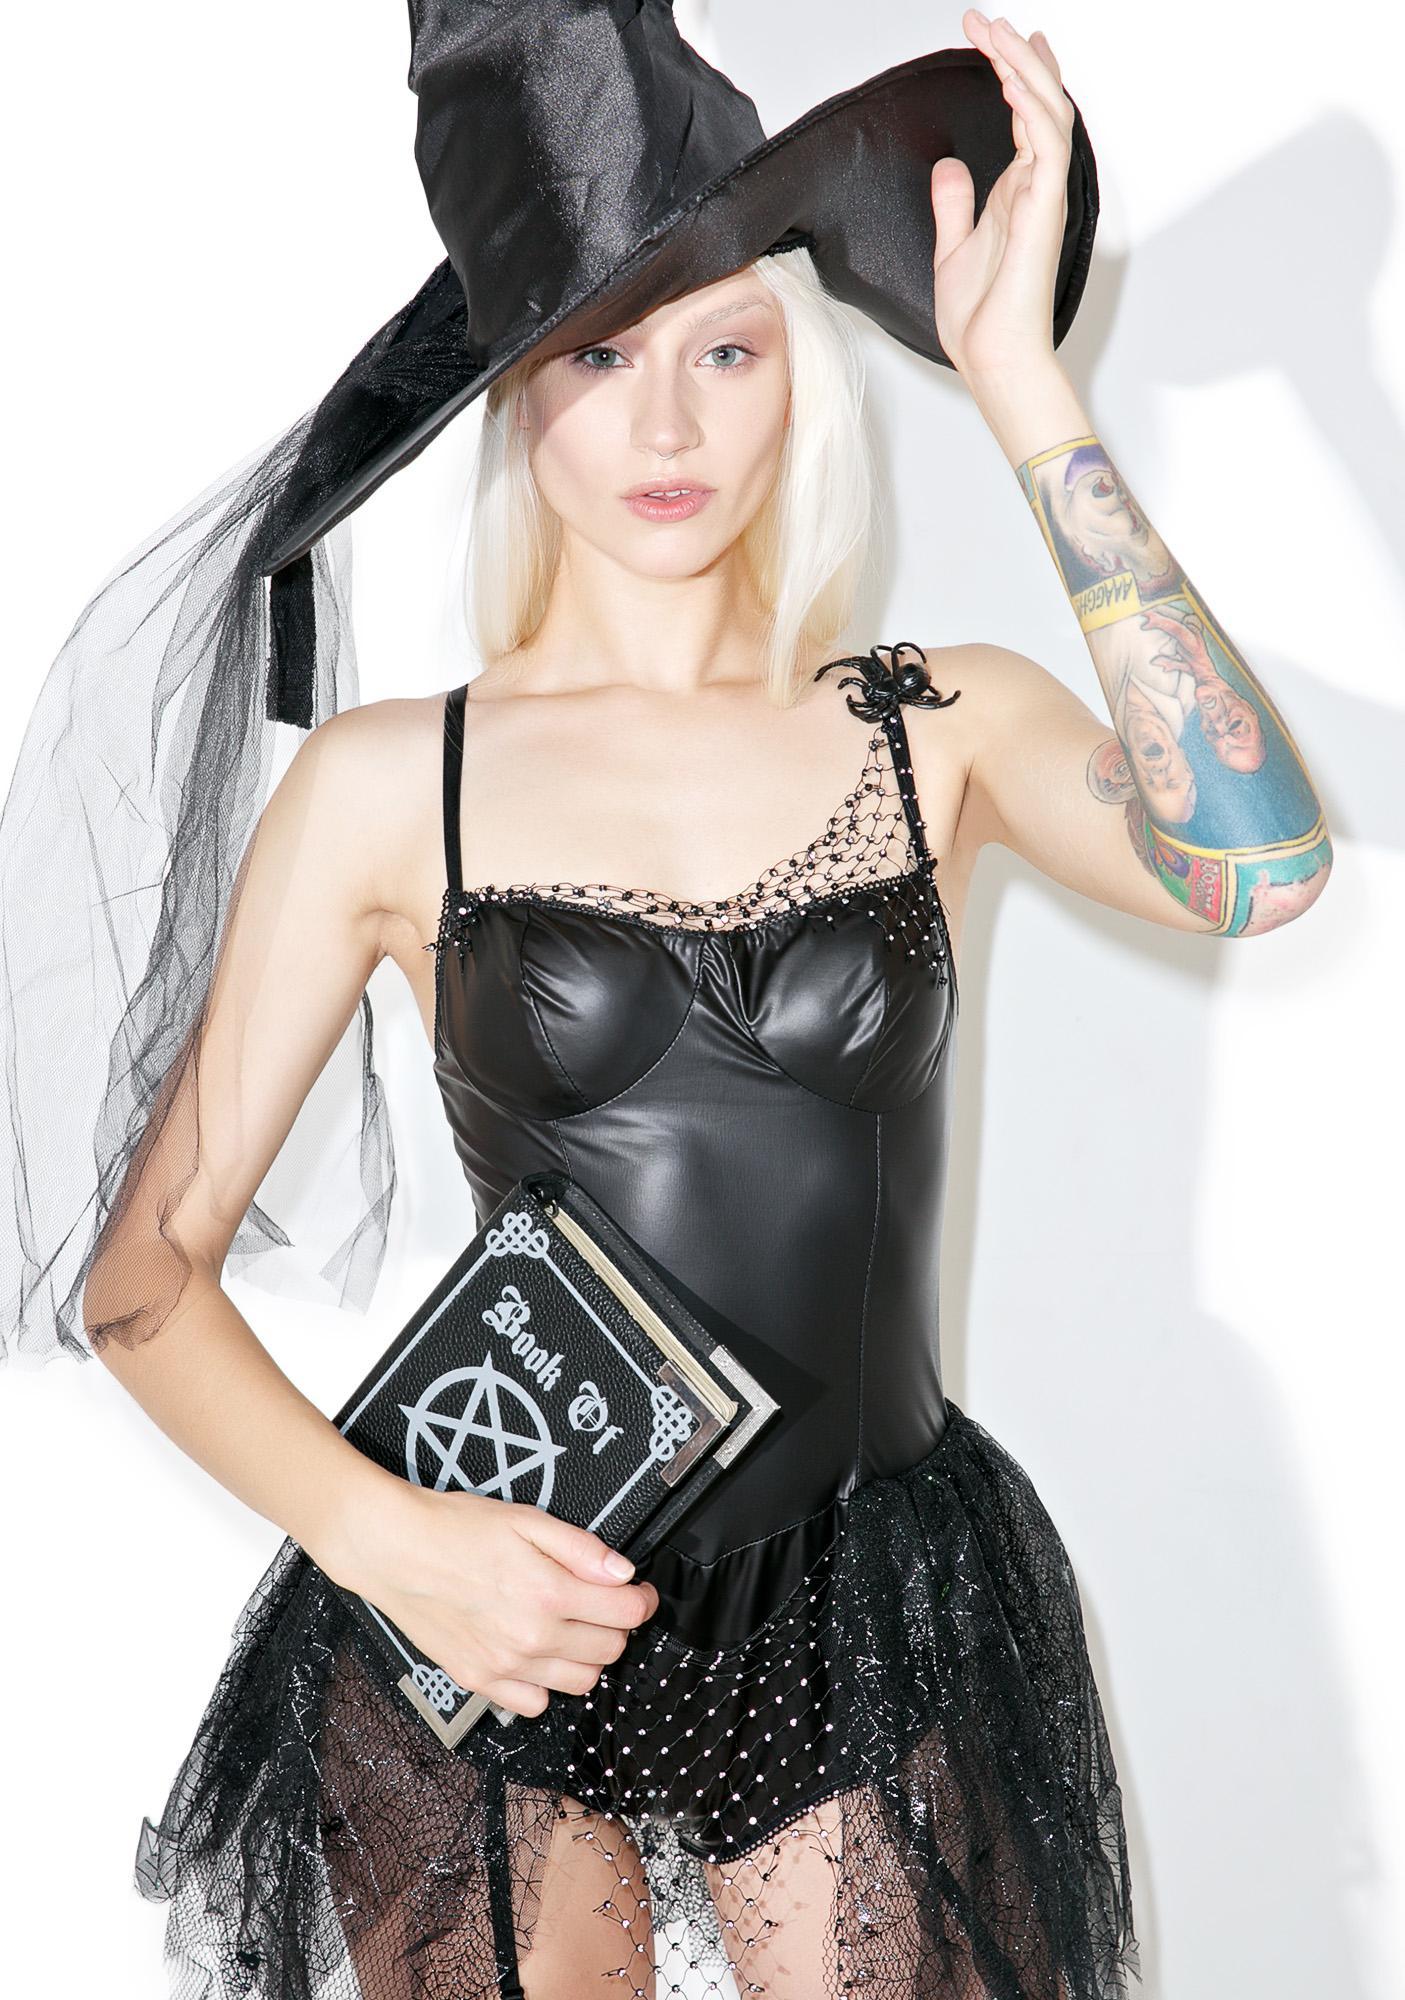 Mizz Witchcraft Costume Set